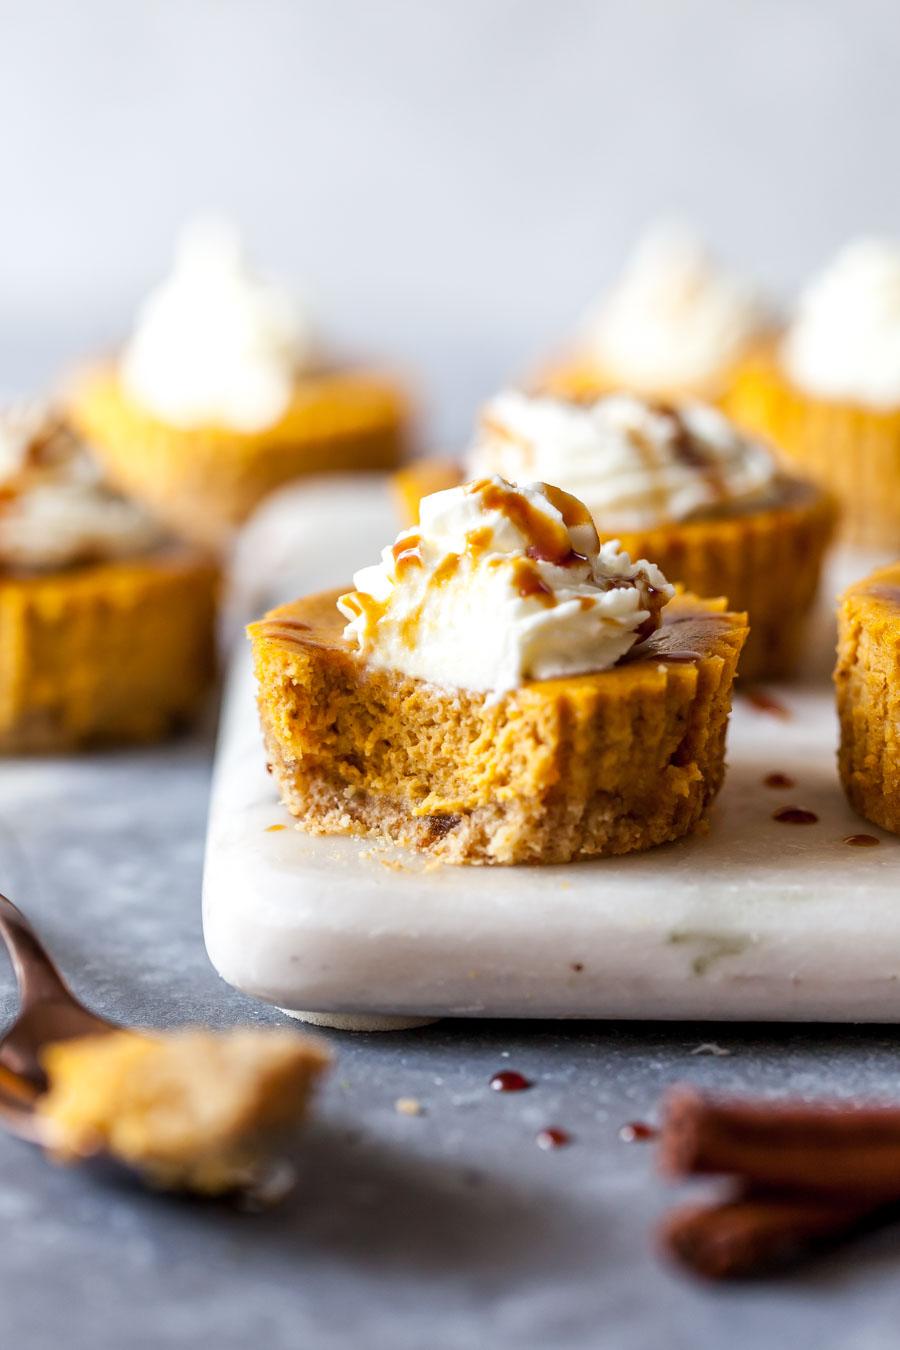 Gluten Free Mini Cheesecakes for Fall